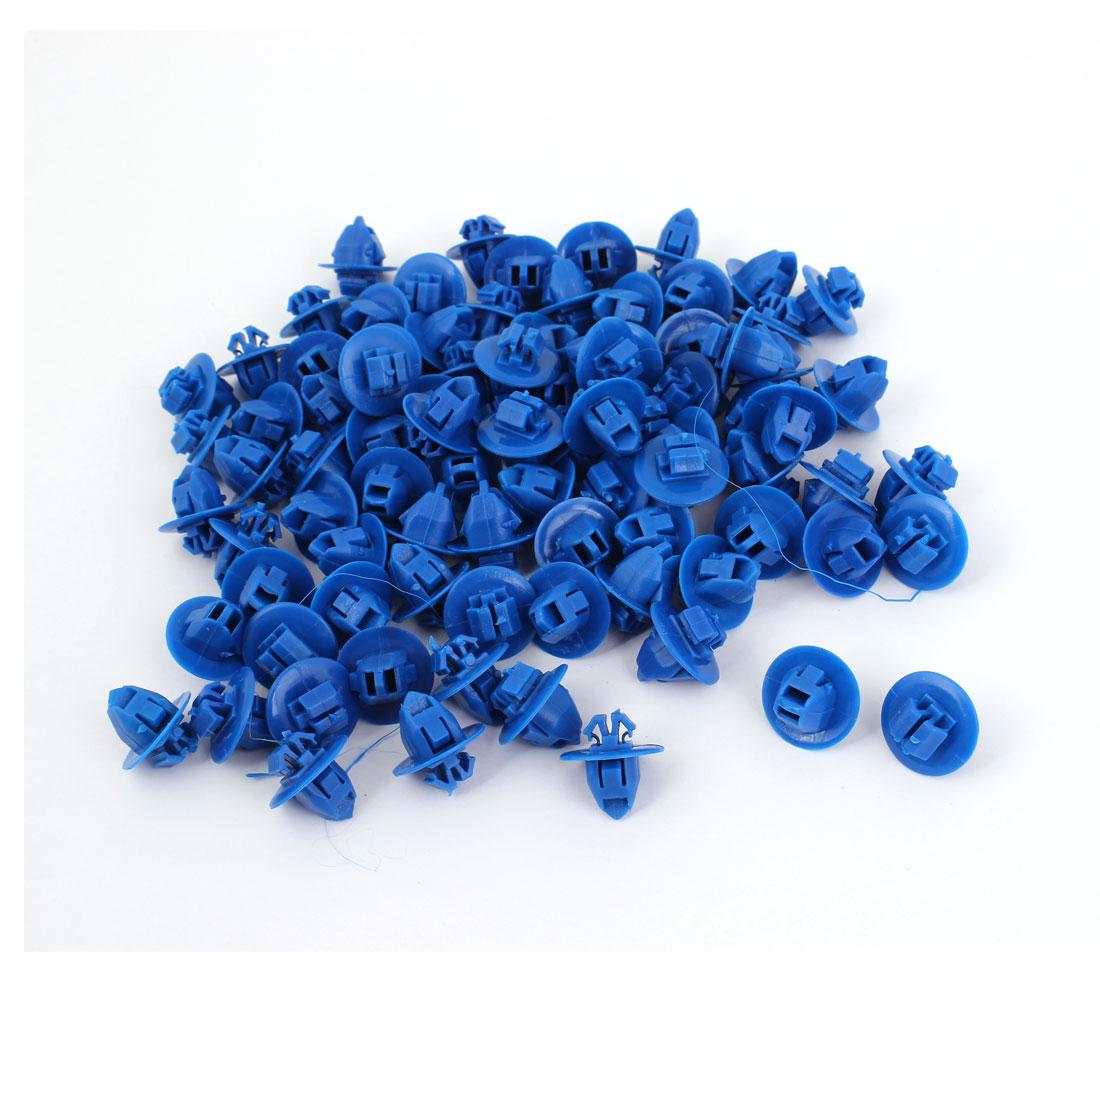 100 Pcs 9 x 8mm Hole Size Blue Plastic Rivet Door Push Fastener for Honda